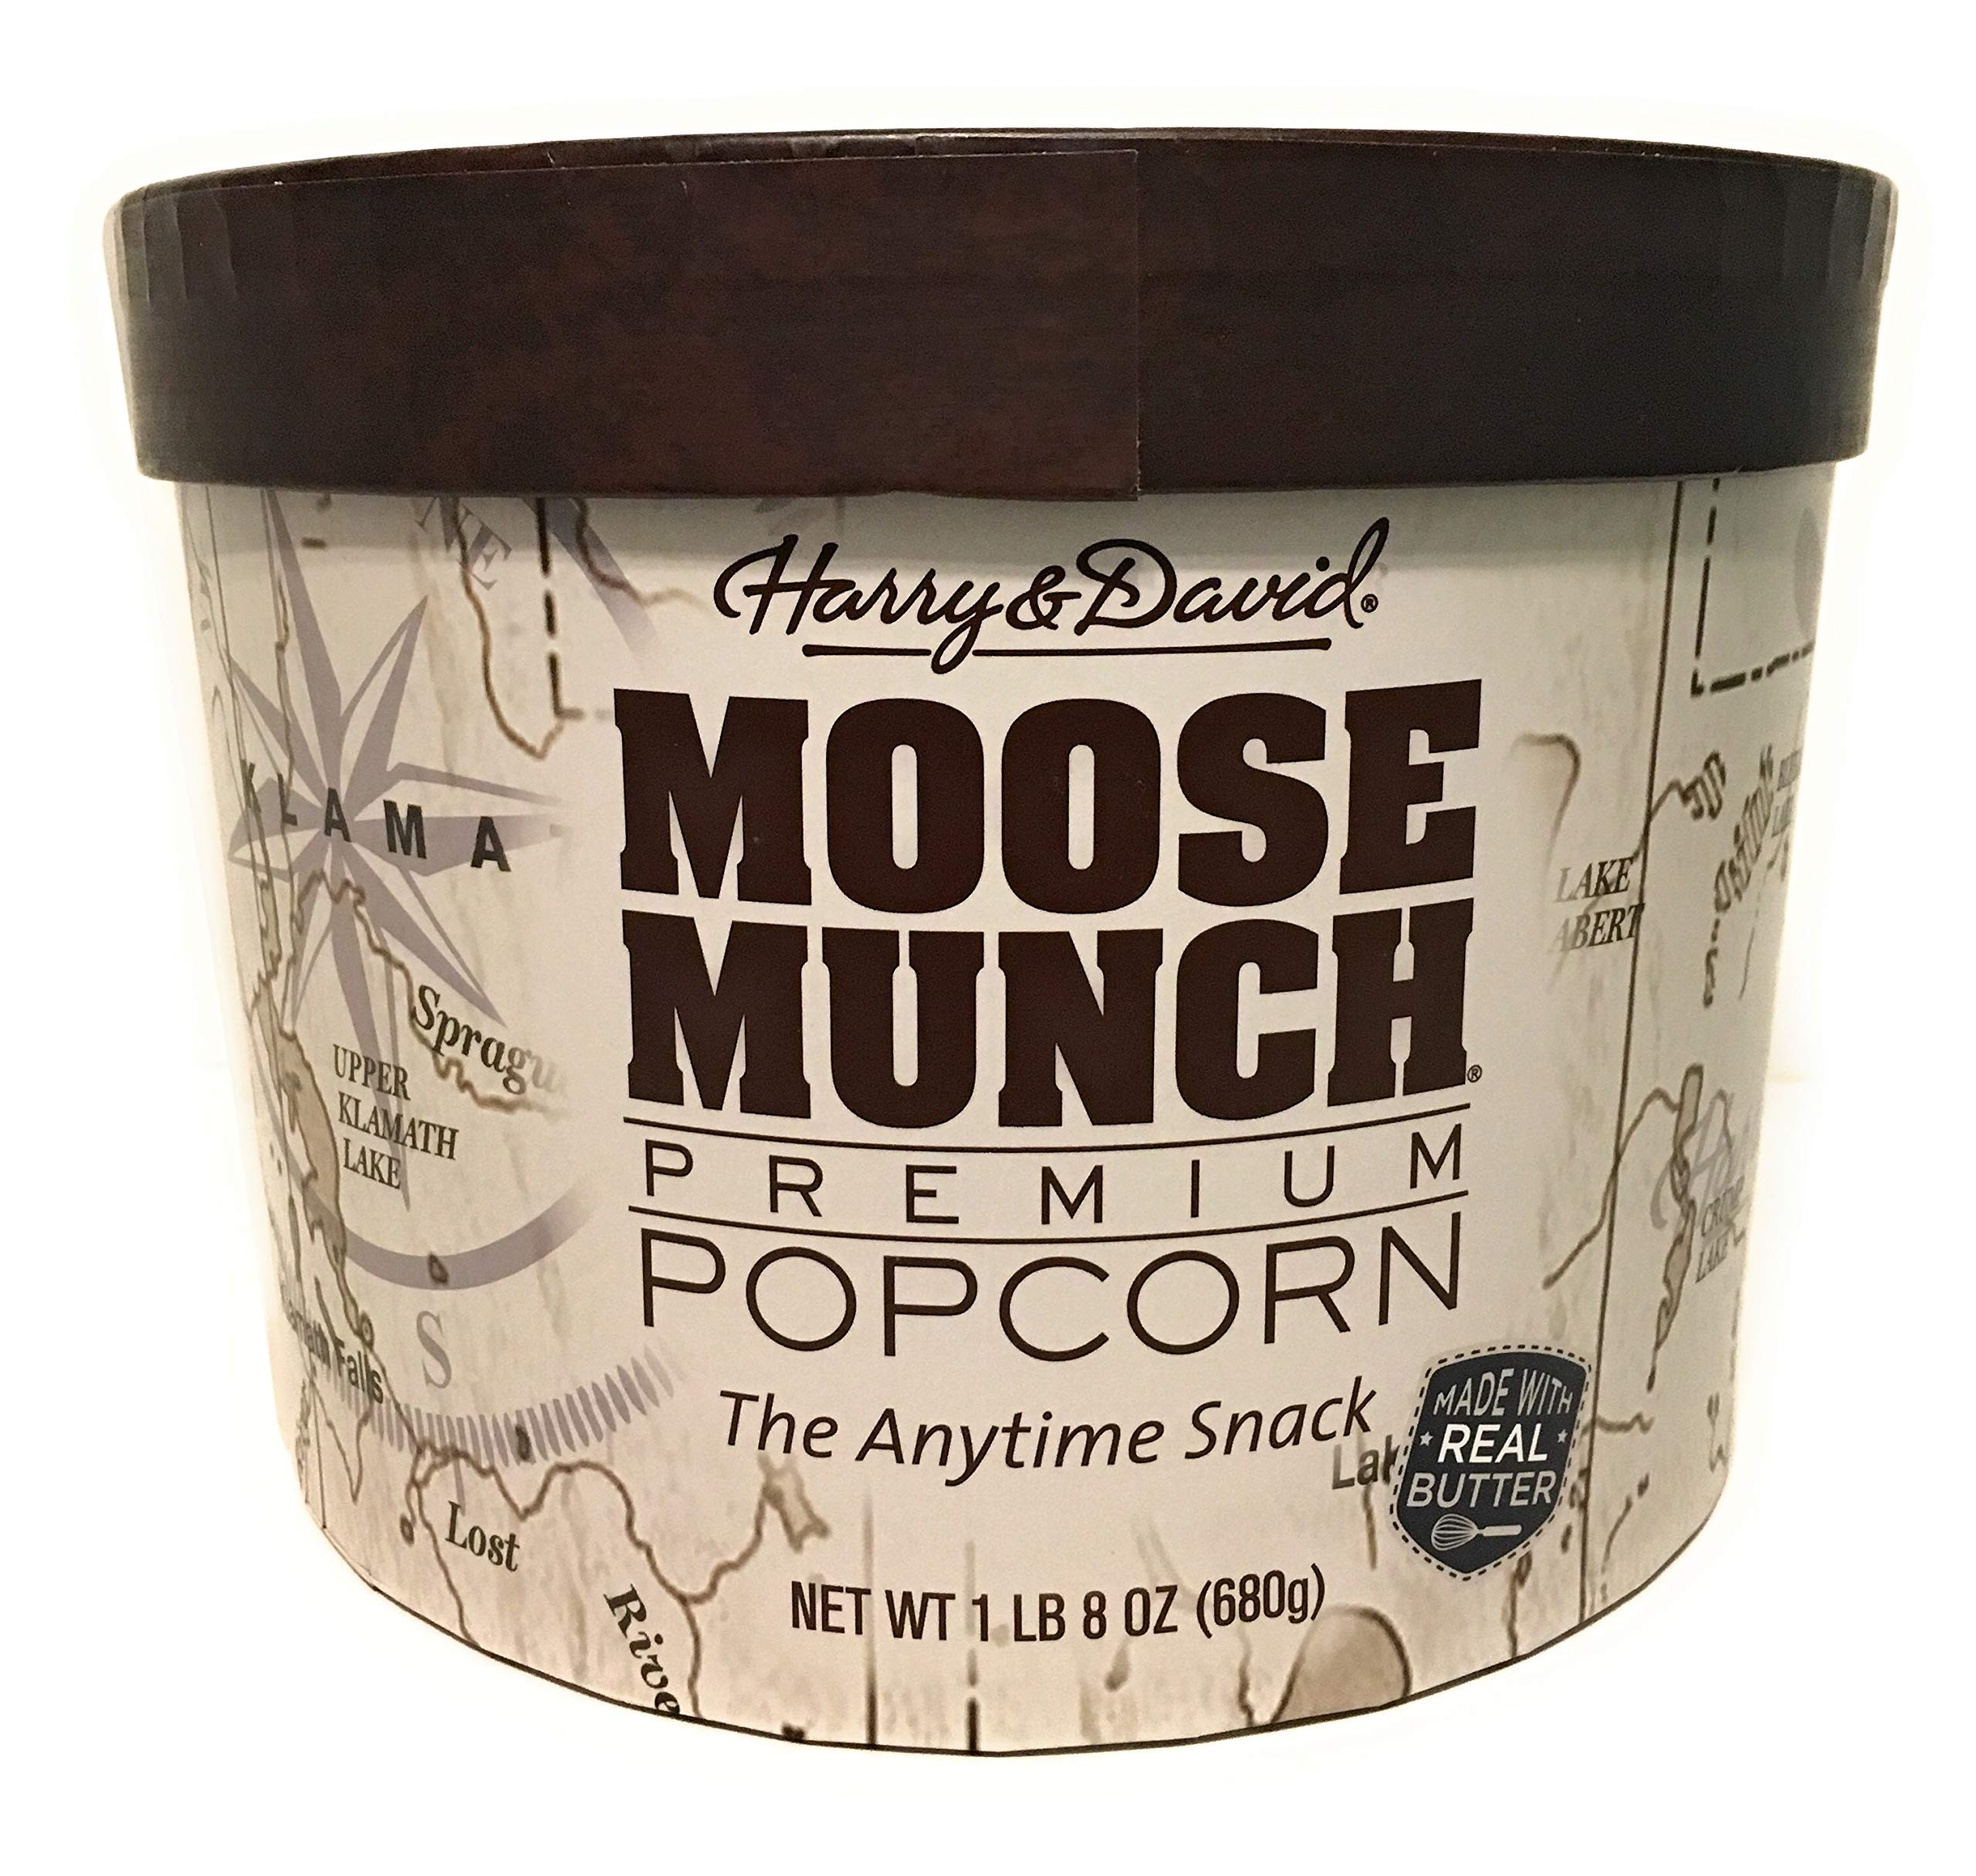 Harry & David Moose Munch Gourmet Popcorn 1lb 8 Oz Assortment Drum by Harry & David